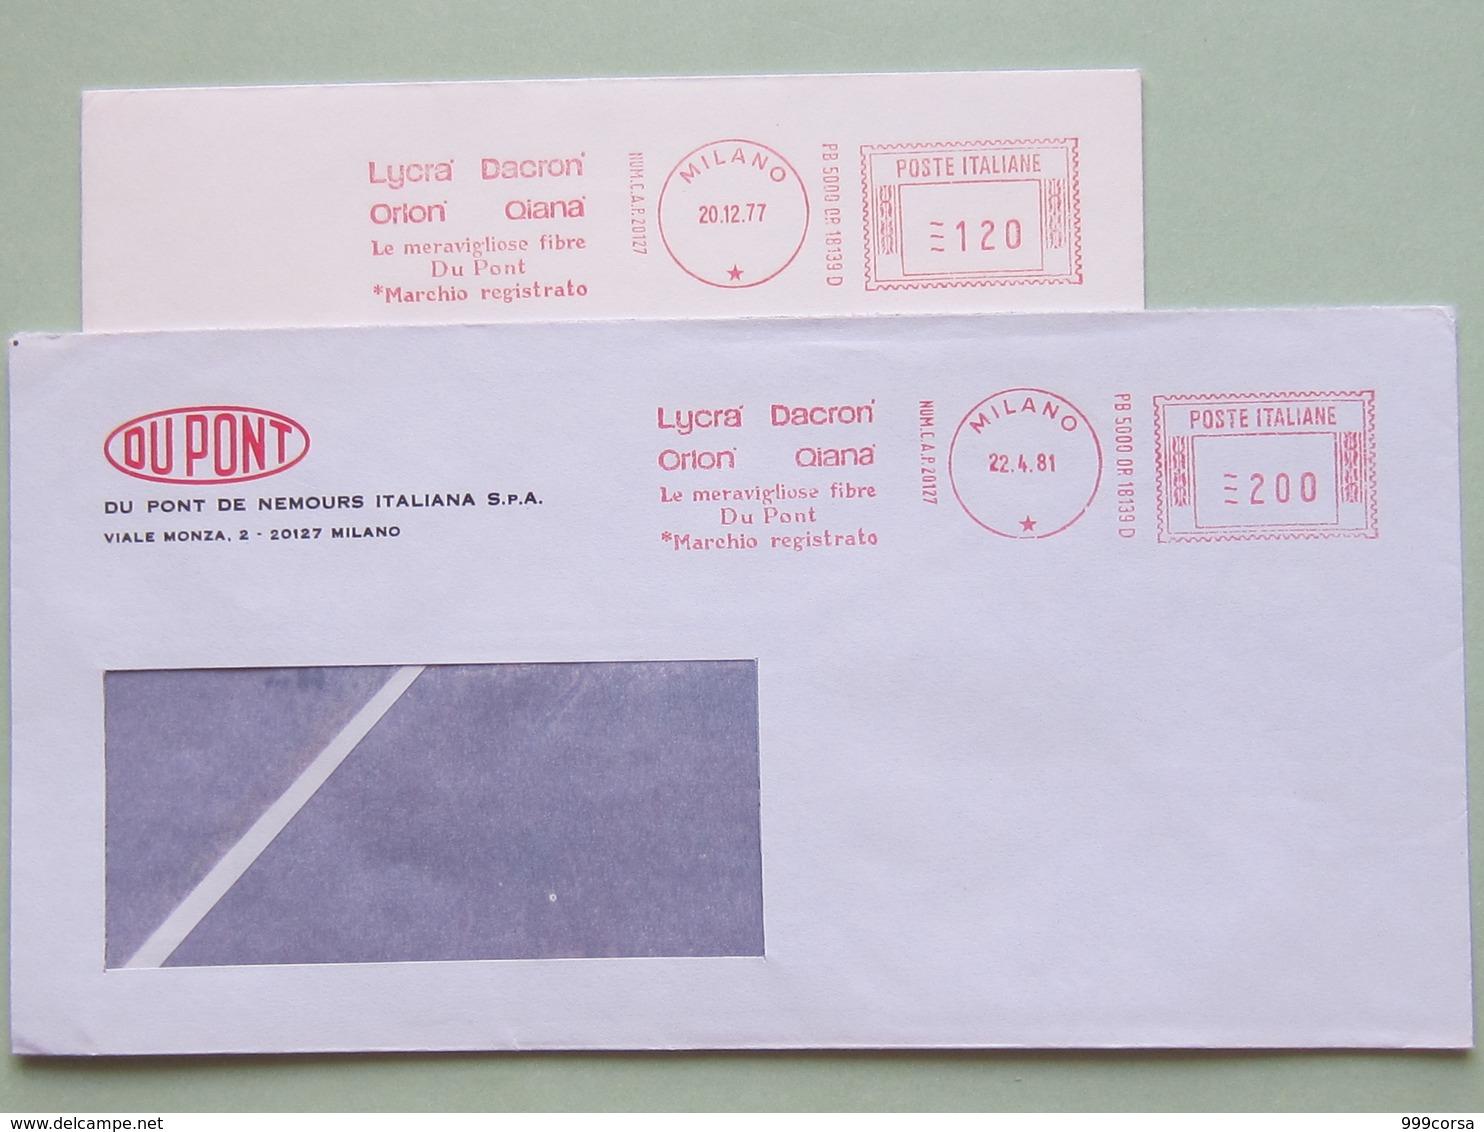 Industria Chimica, Tessili, Du Pont, Fibre Sintetiche,(DZ) 2 Affranc. Meccaniche Diverse, Ema, Meter,1977 E 1981 - Fabbriche E Imprese